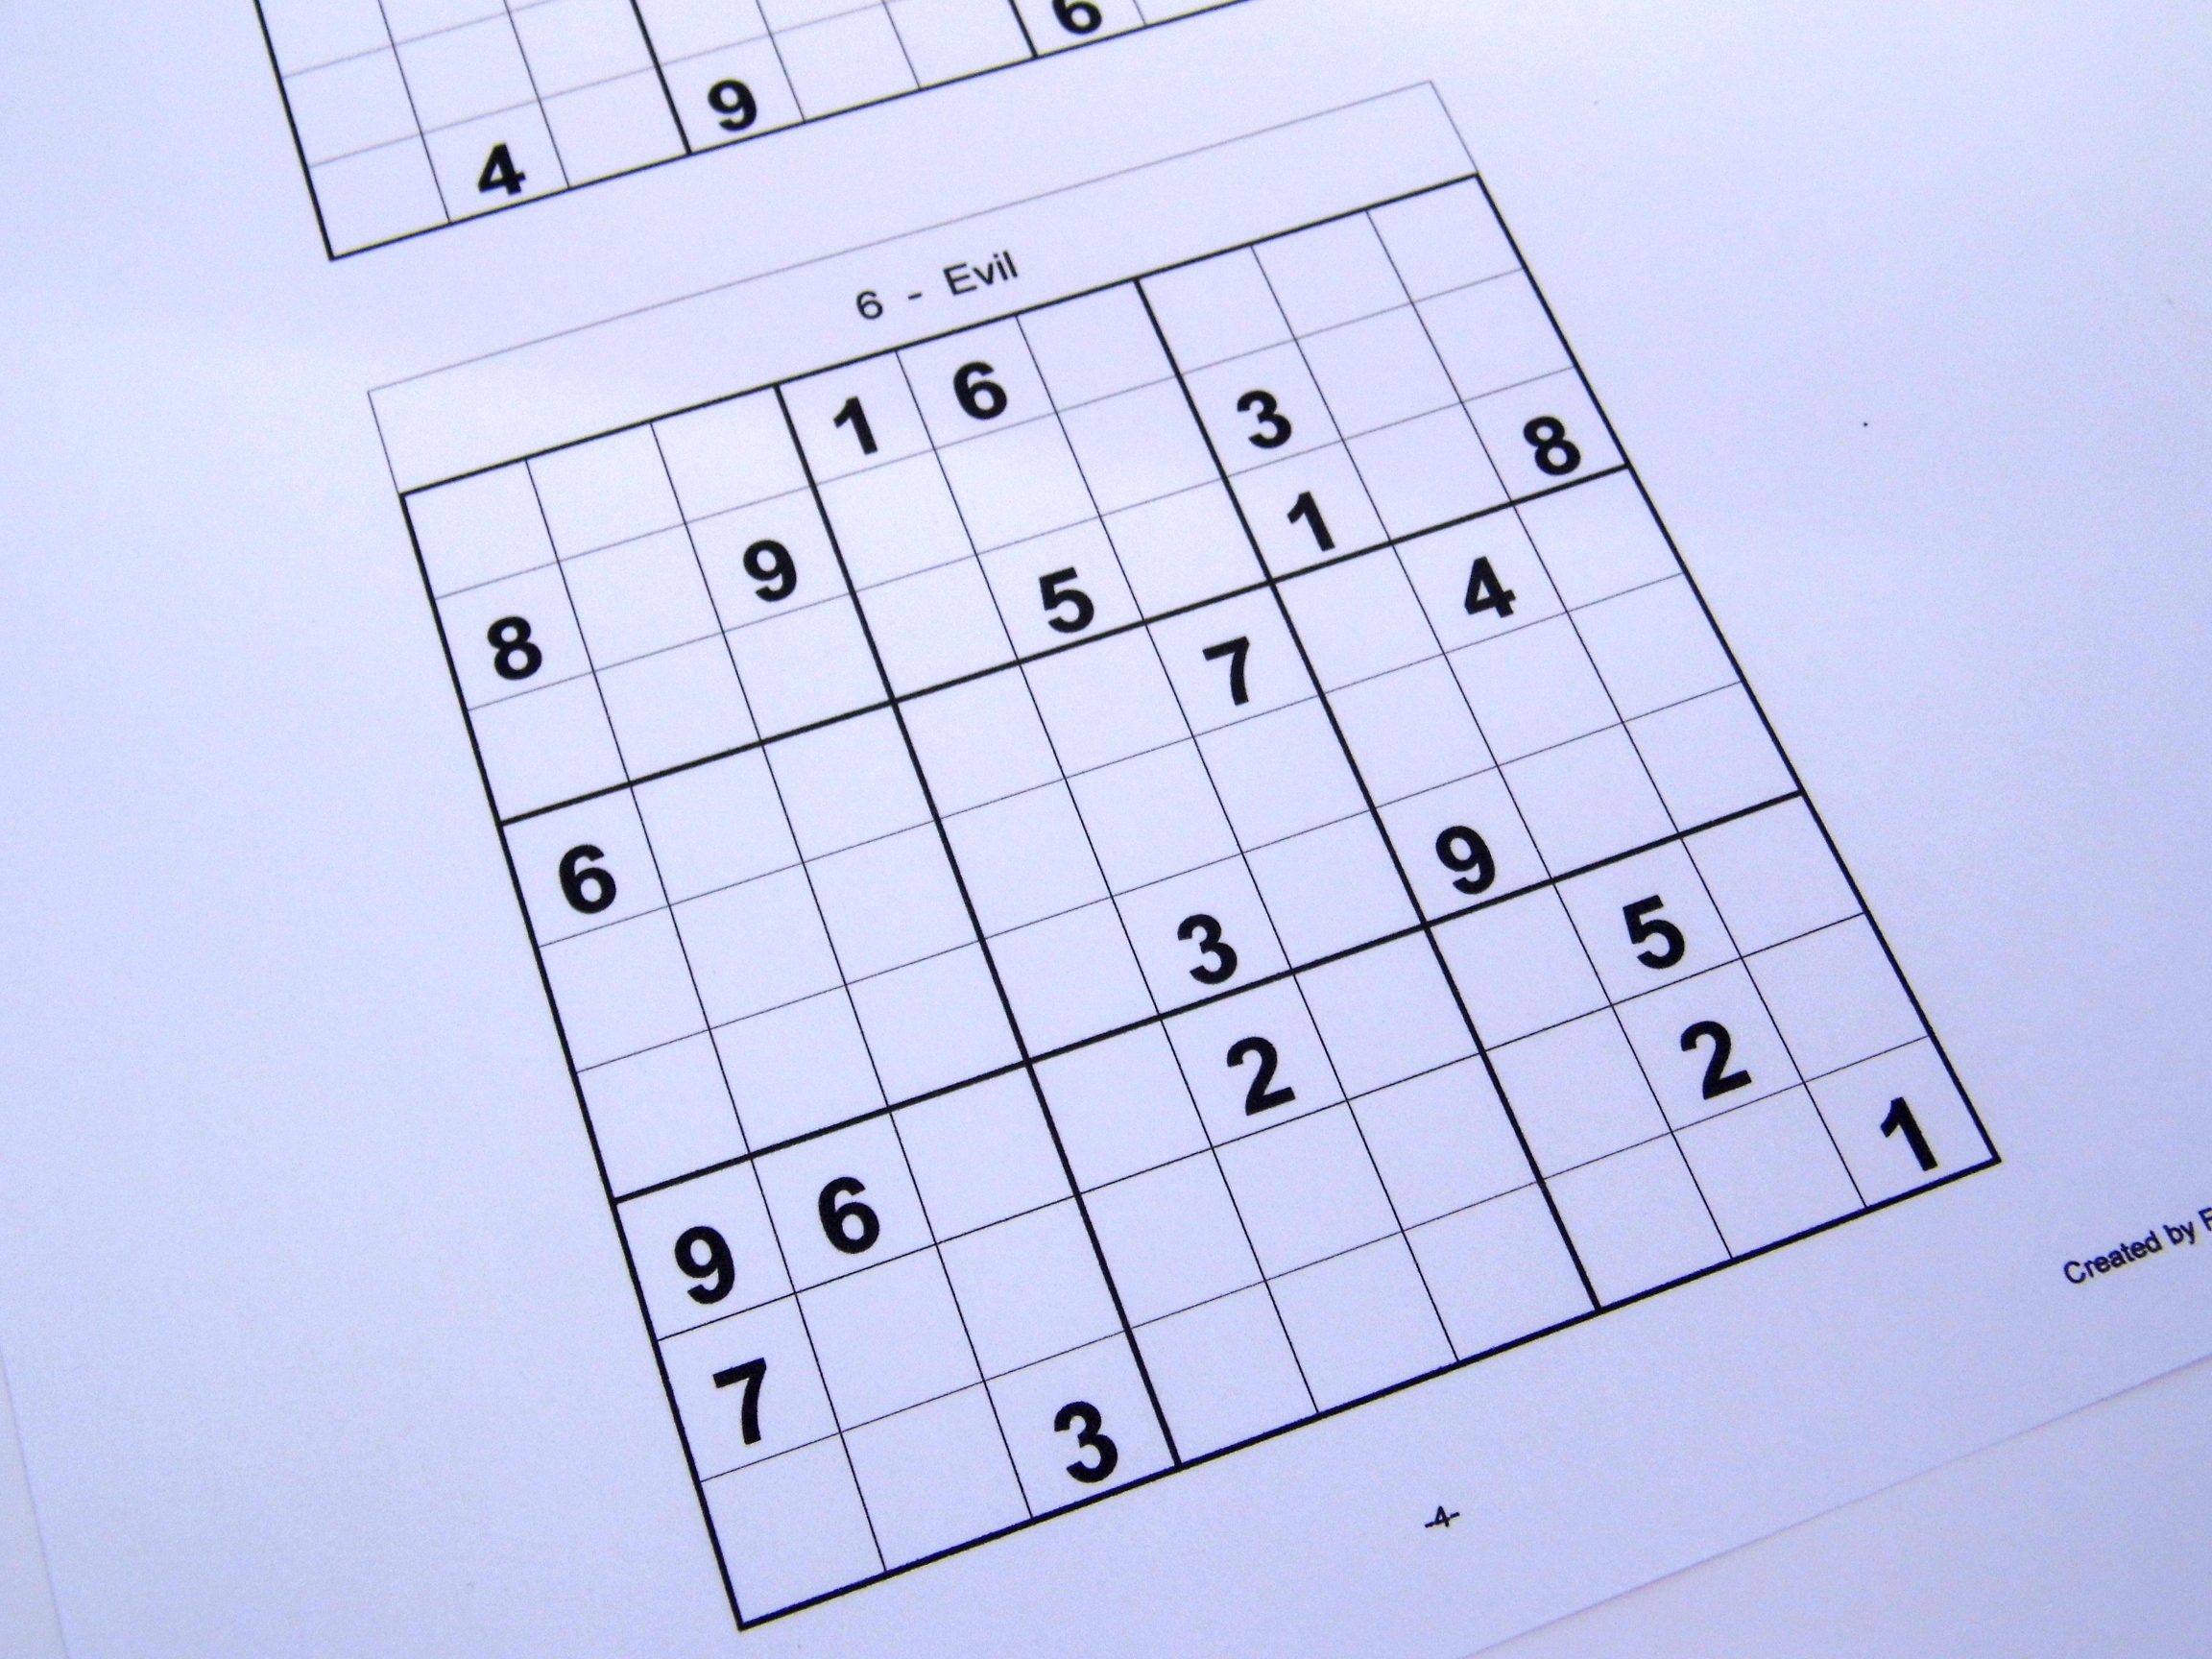 Hard Printable Sudoku Puzzles 6 Per Page – Book 1 – Free Sudoku Puzzles - Printable Sudoku Puzzles 1 Per Page